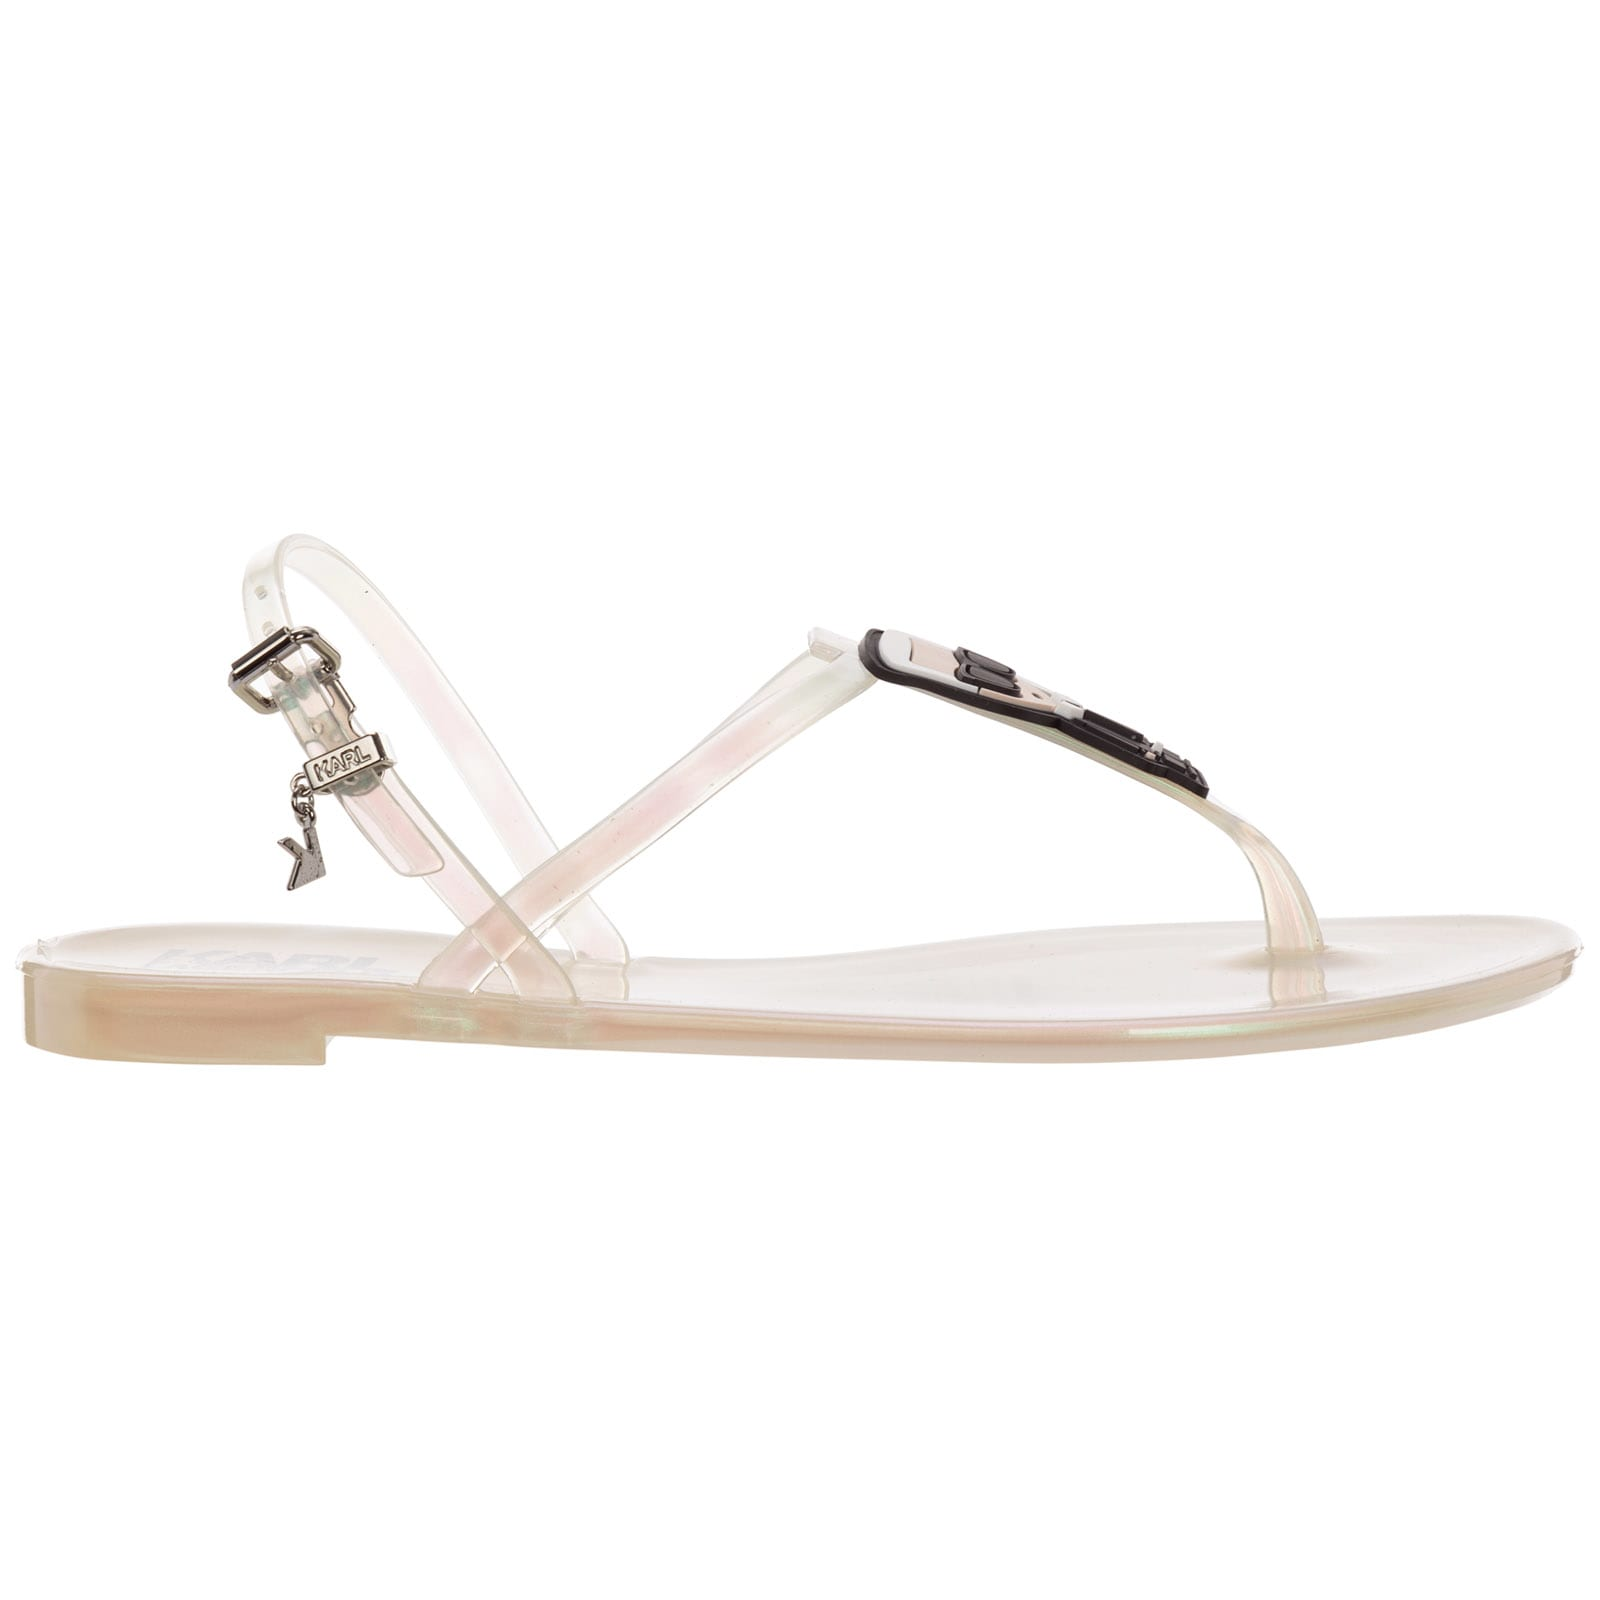 Karl Lagerfeld Jelly T-bar Sandals